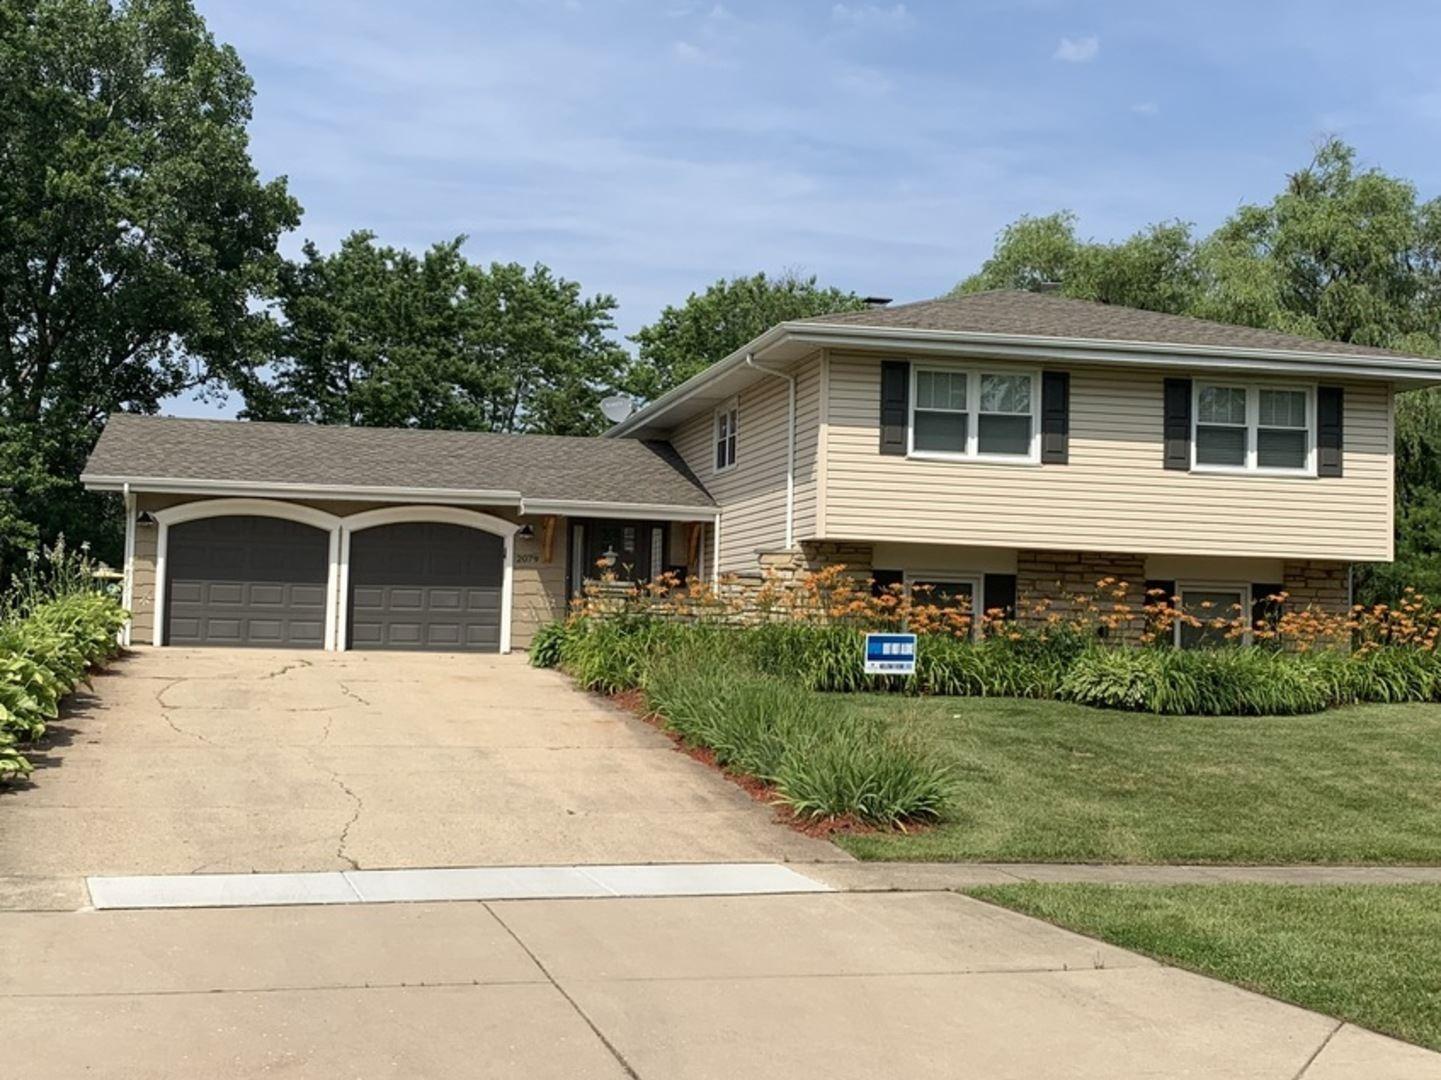 2079 Parkview Circle E, Hoffman Estates, IL 60169 - #: 10778121